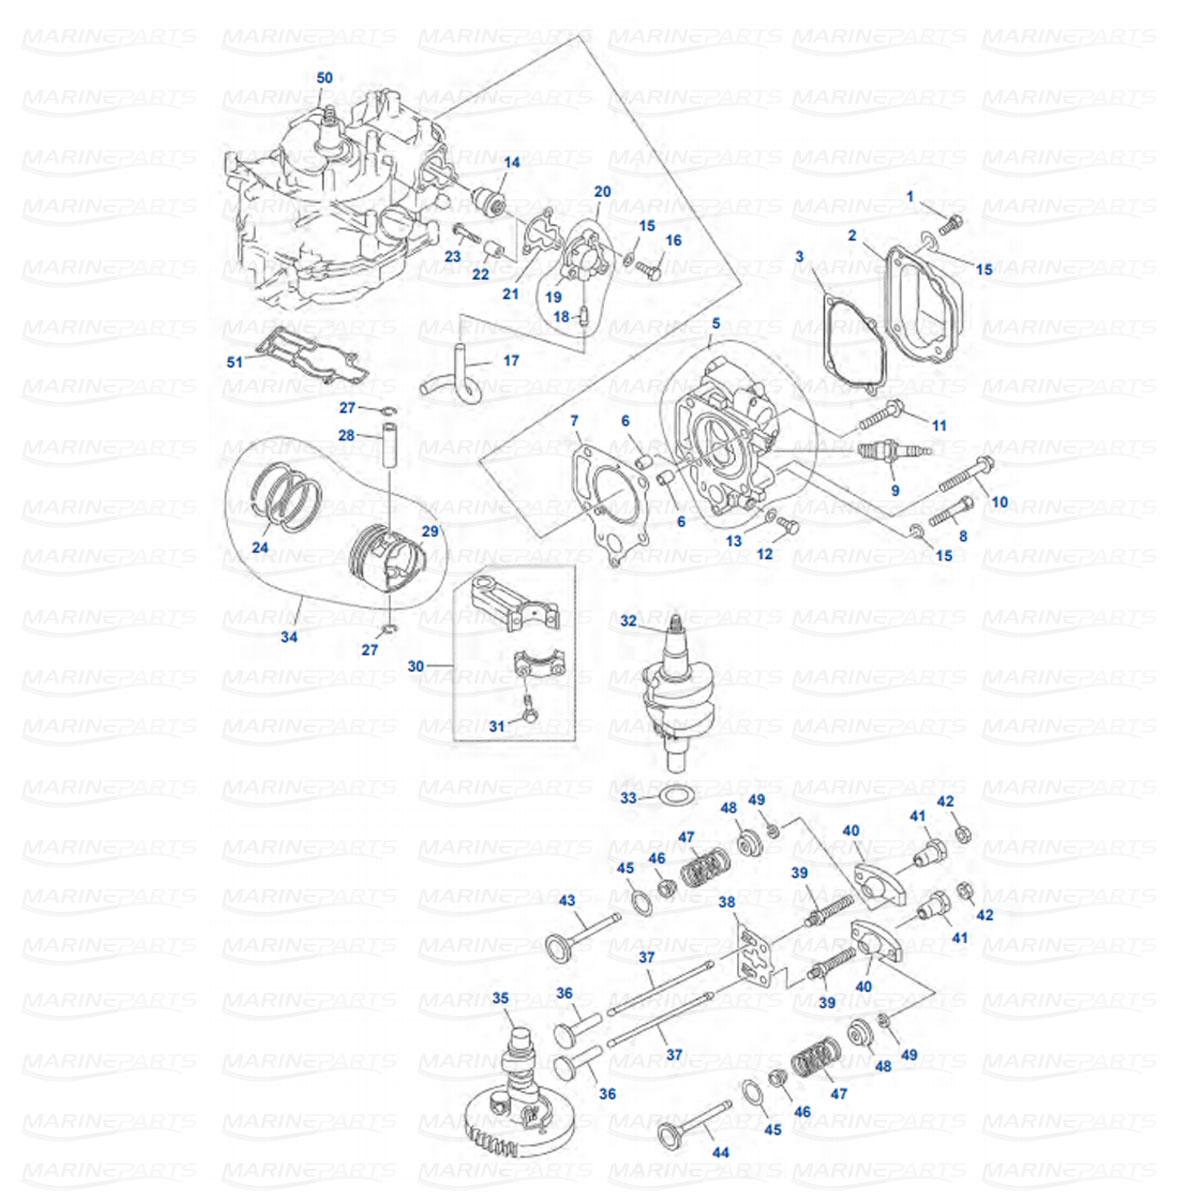 Moottorilohkon varaosat Yamaha F4A/MSHA-C/AMH/MLHB-S/MH/MLHE (2002-09)